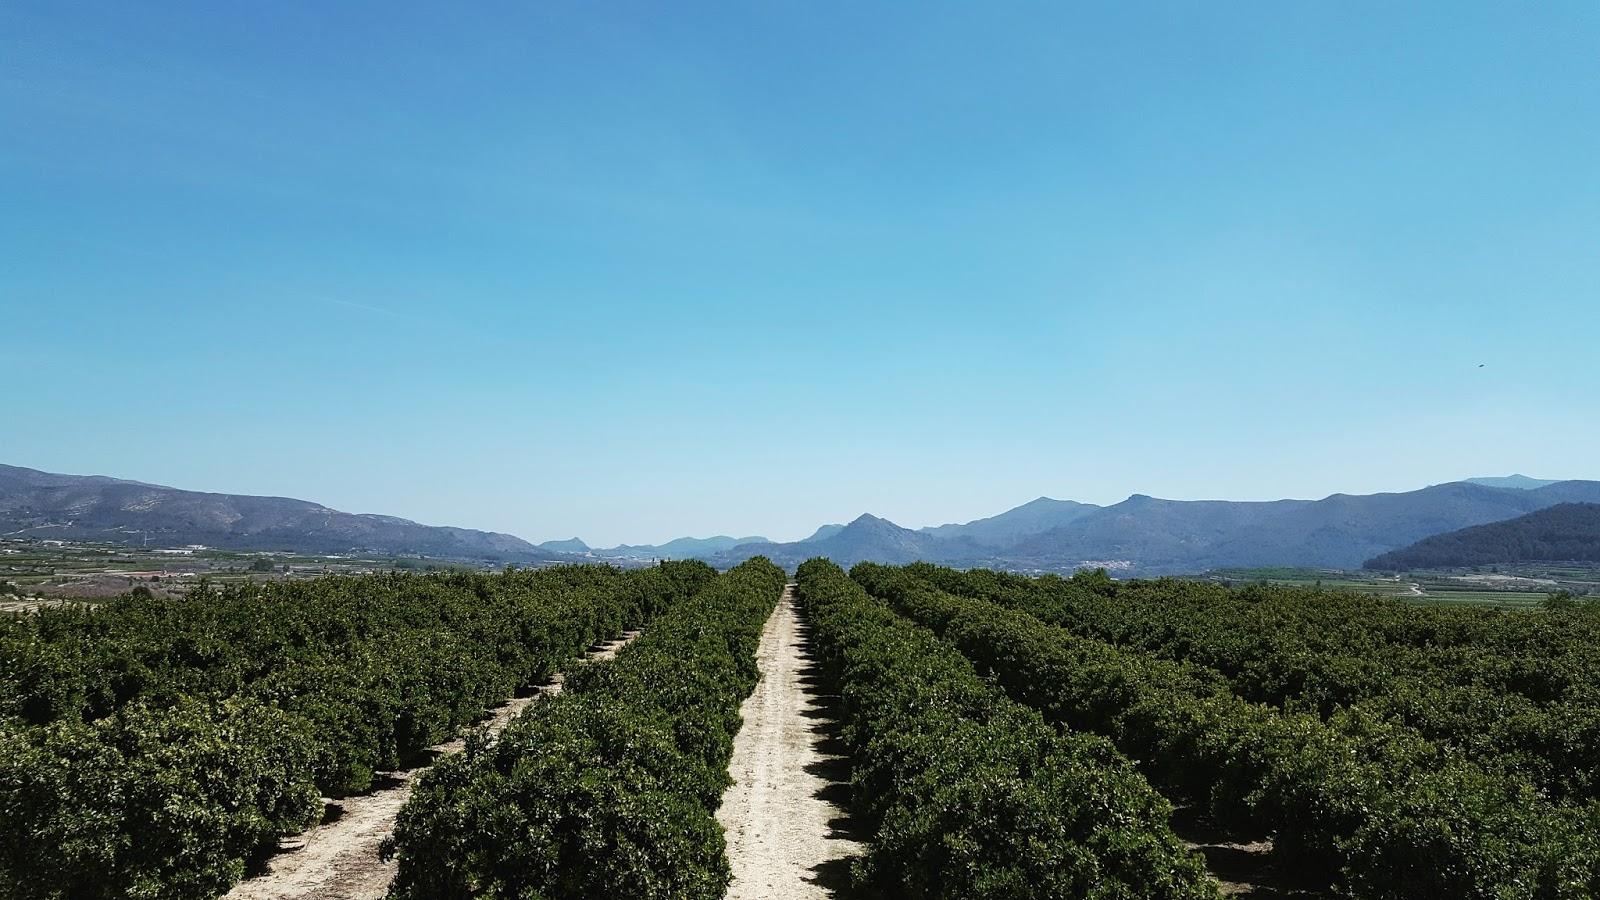 Orange groves in the Valencian Community, Spain